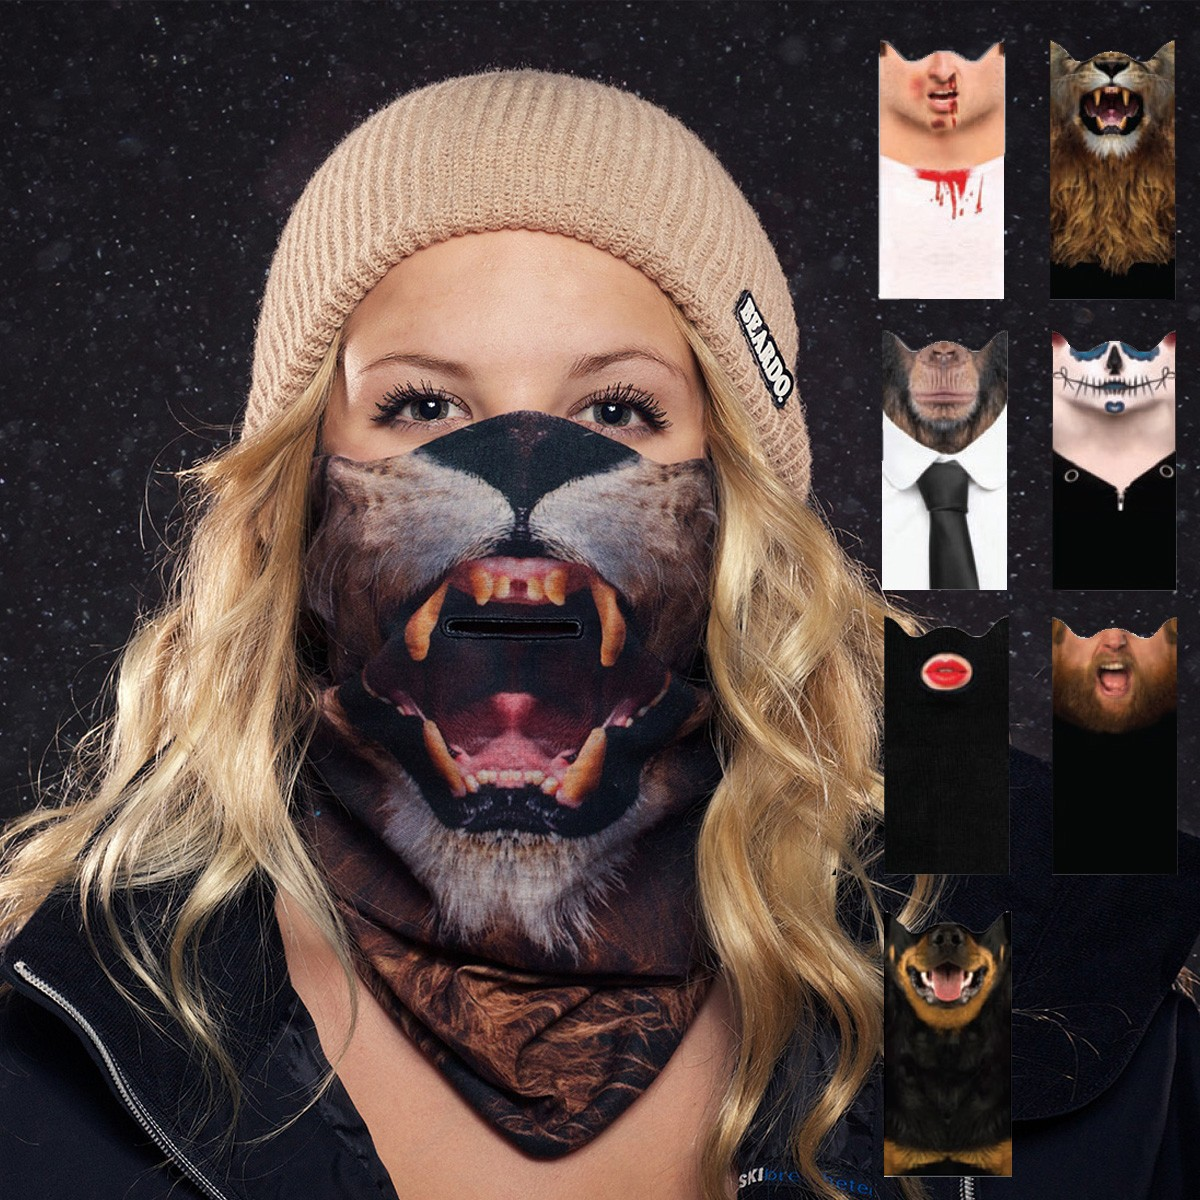 Maska narciarska ze zdjeciem jakości HD